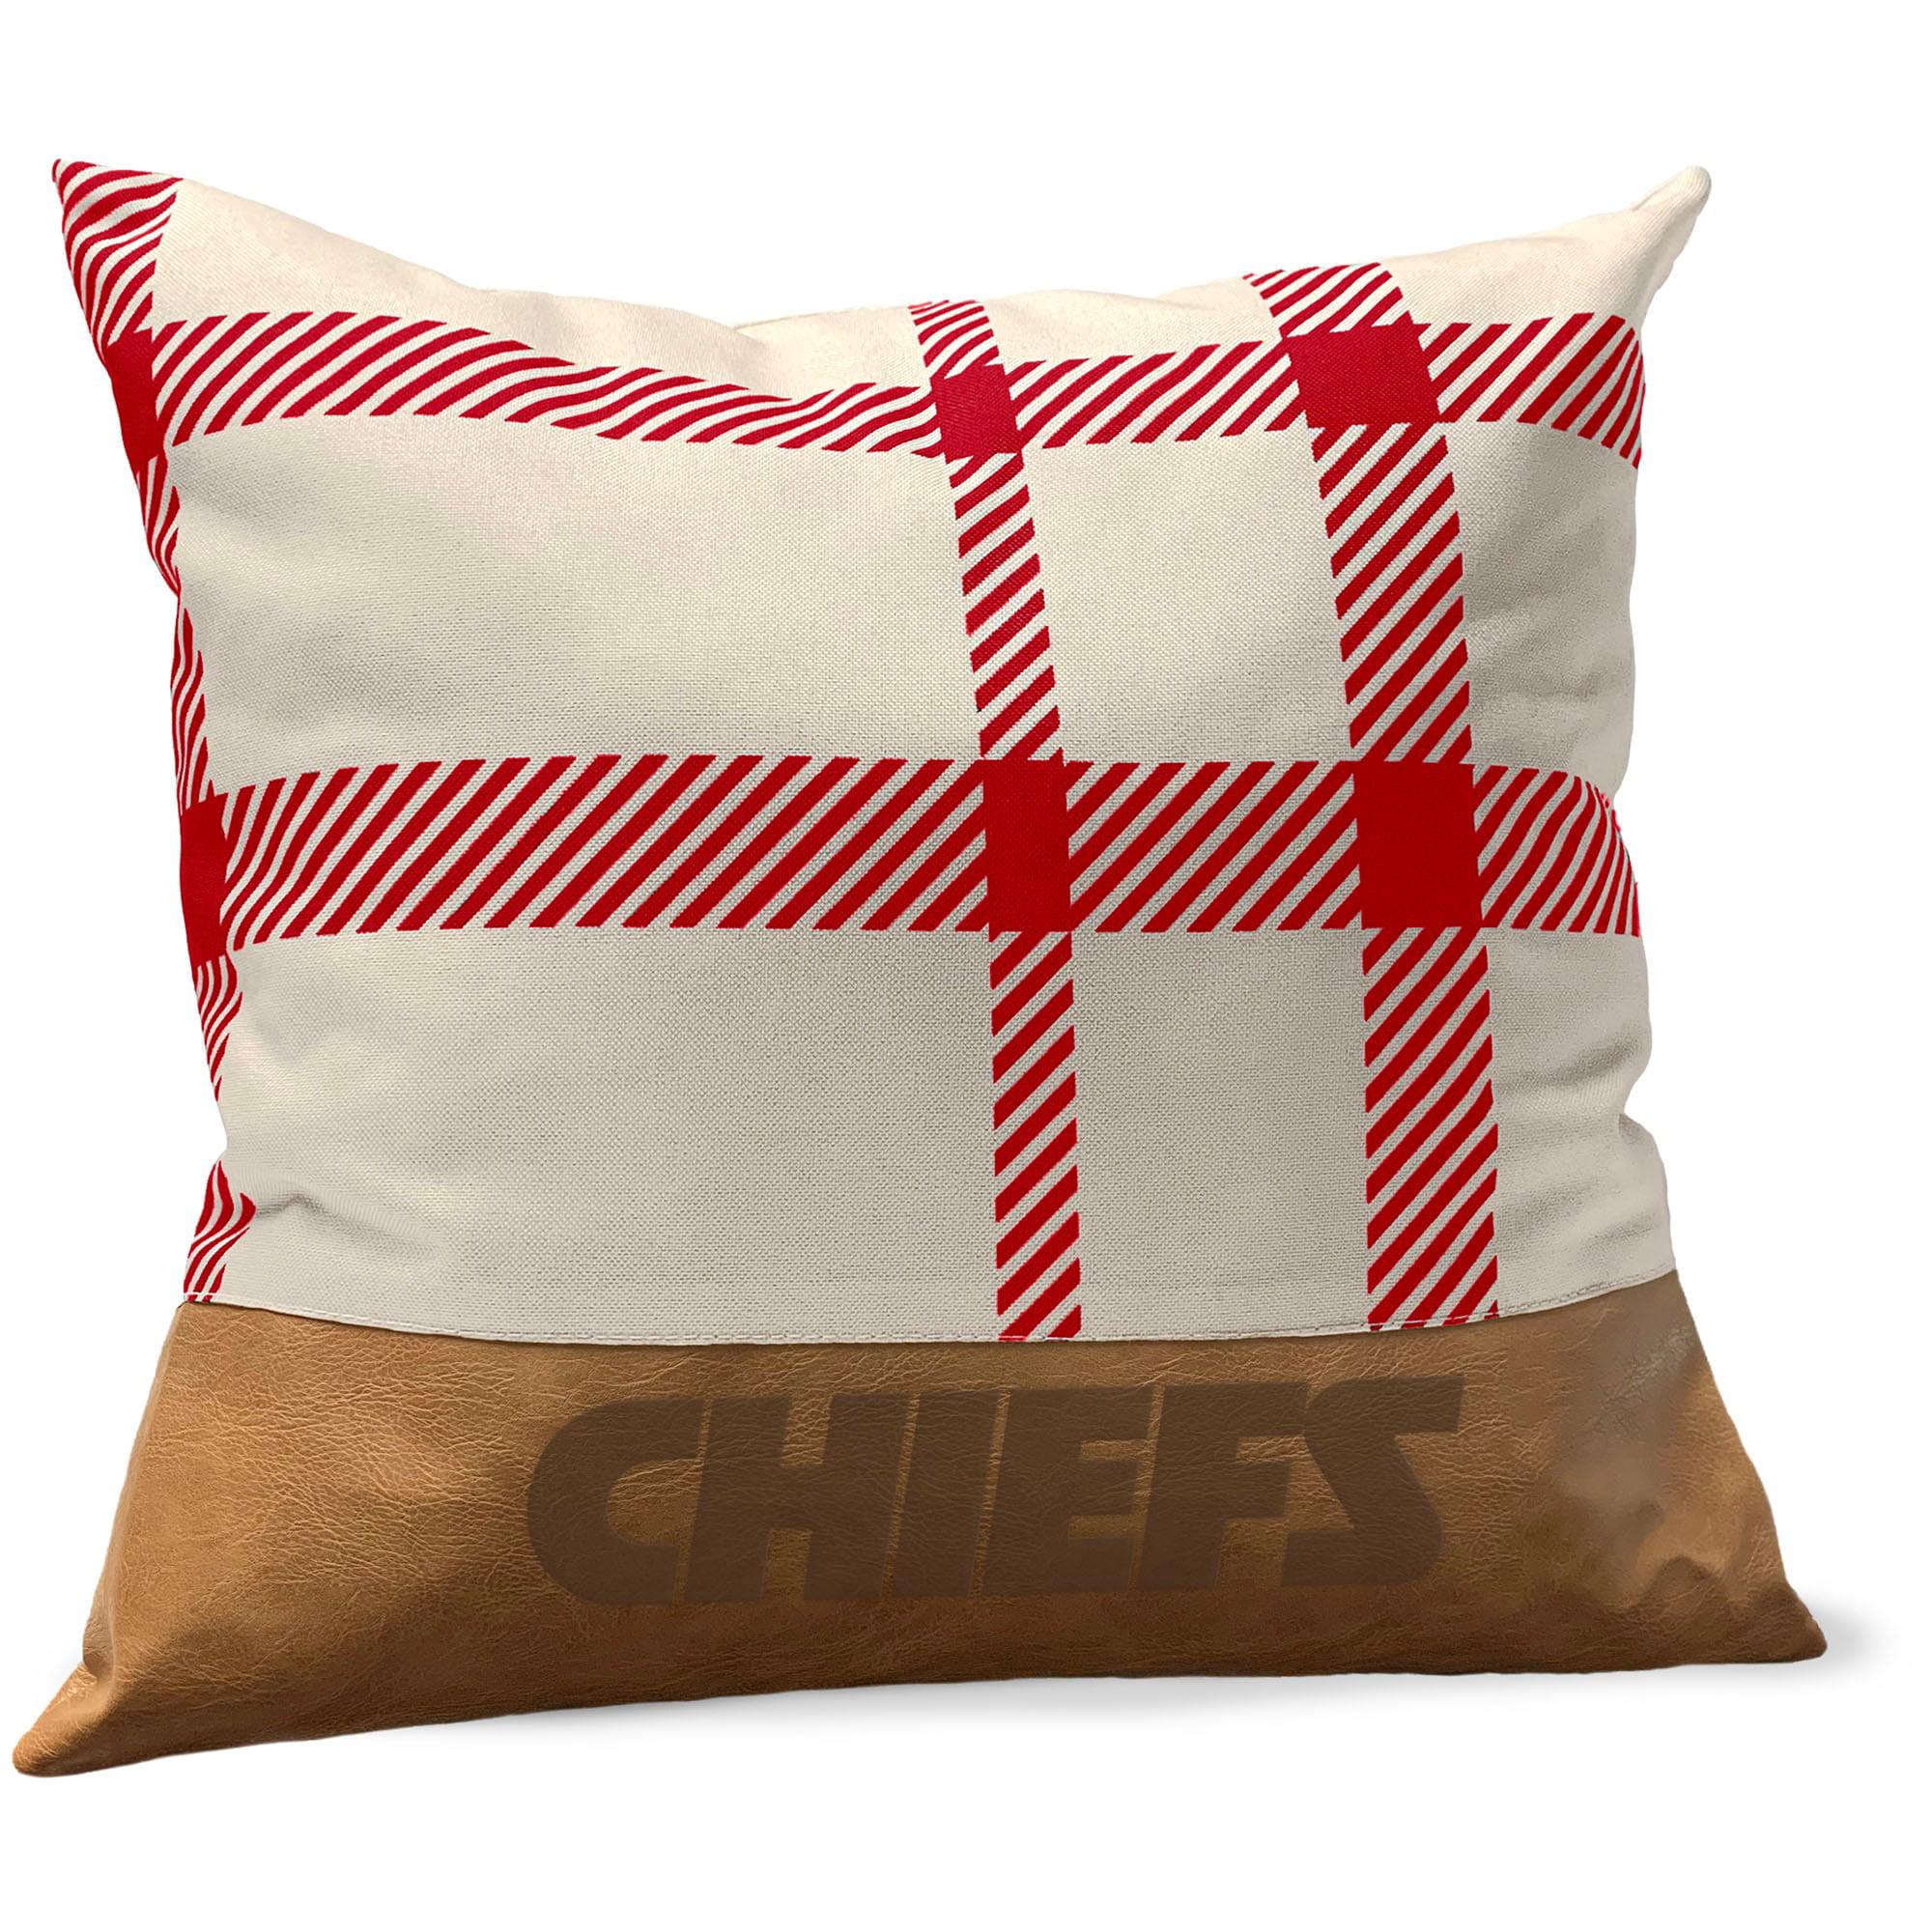 Kansas City Chiefs 18 X 18 Farmhouse Plaid Faux Leather Throw Pillow Walmart Com Walmart Com